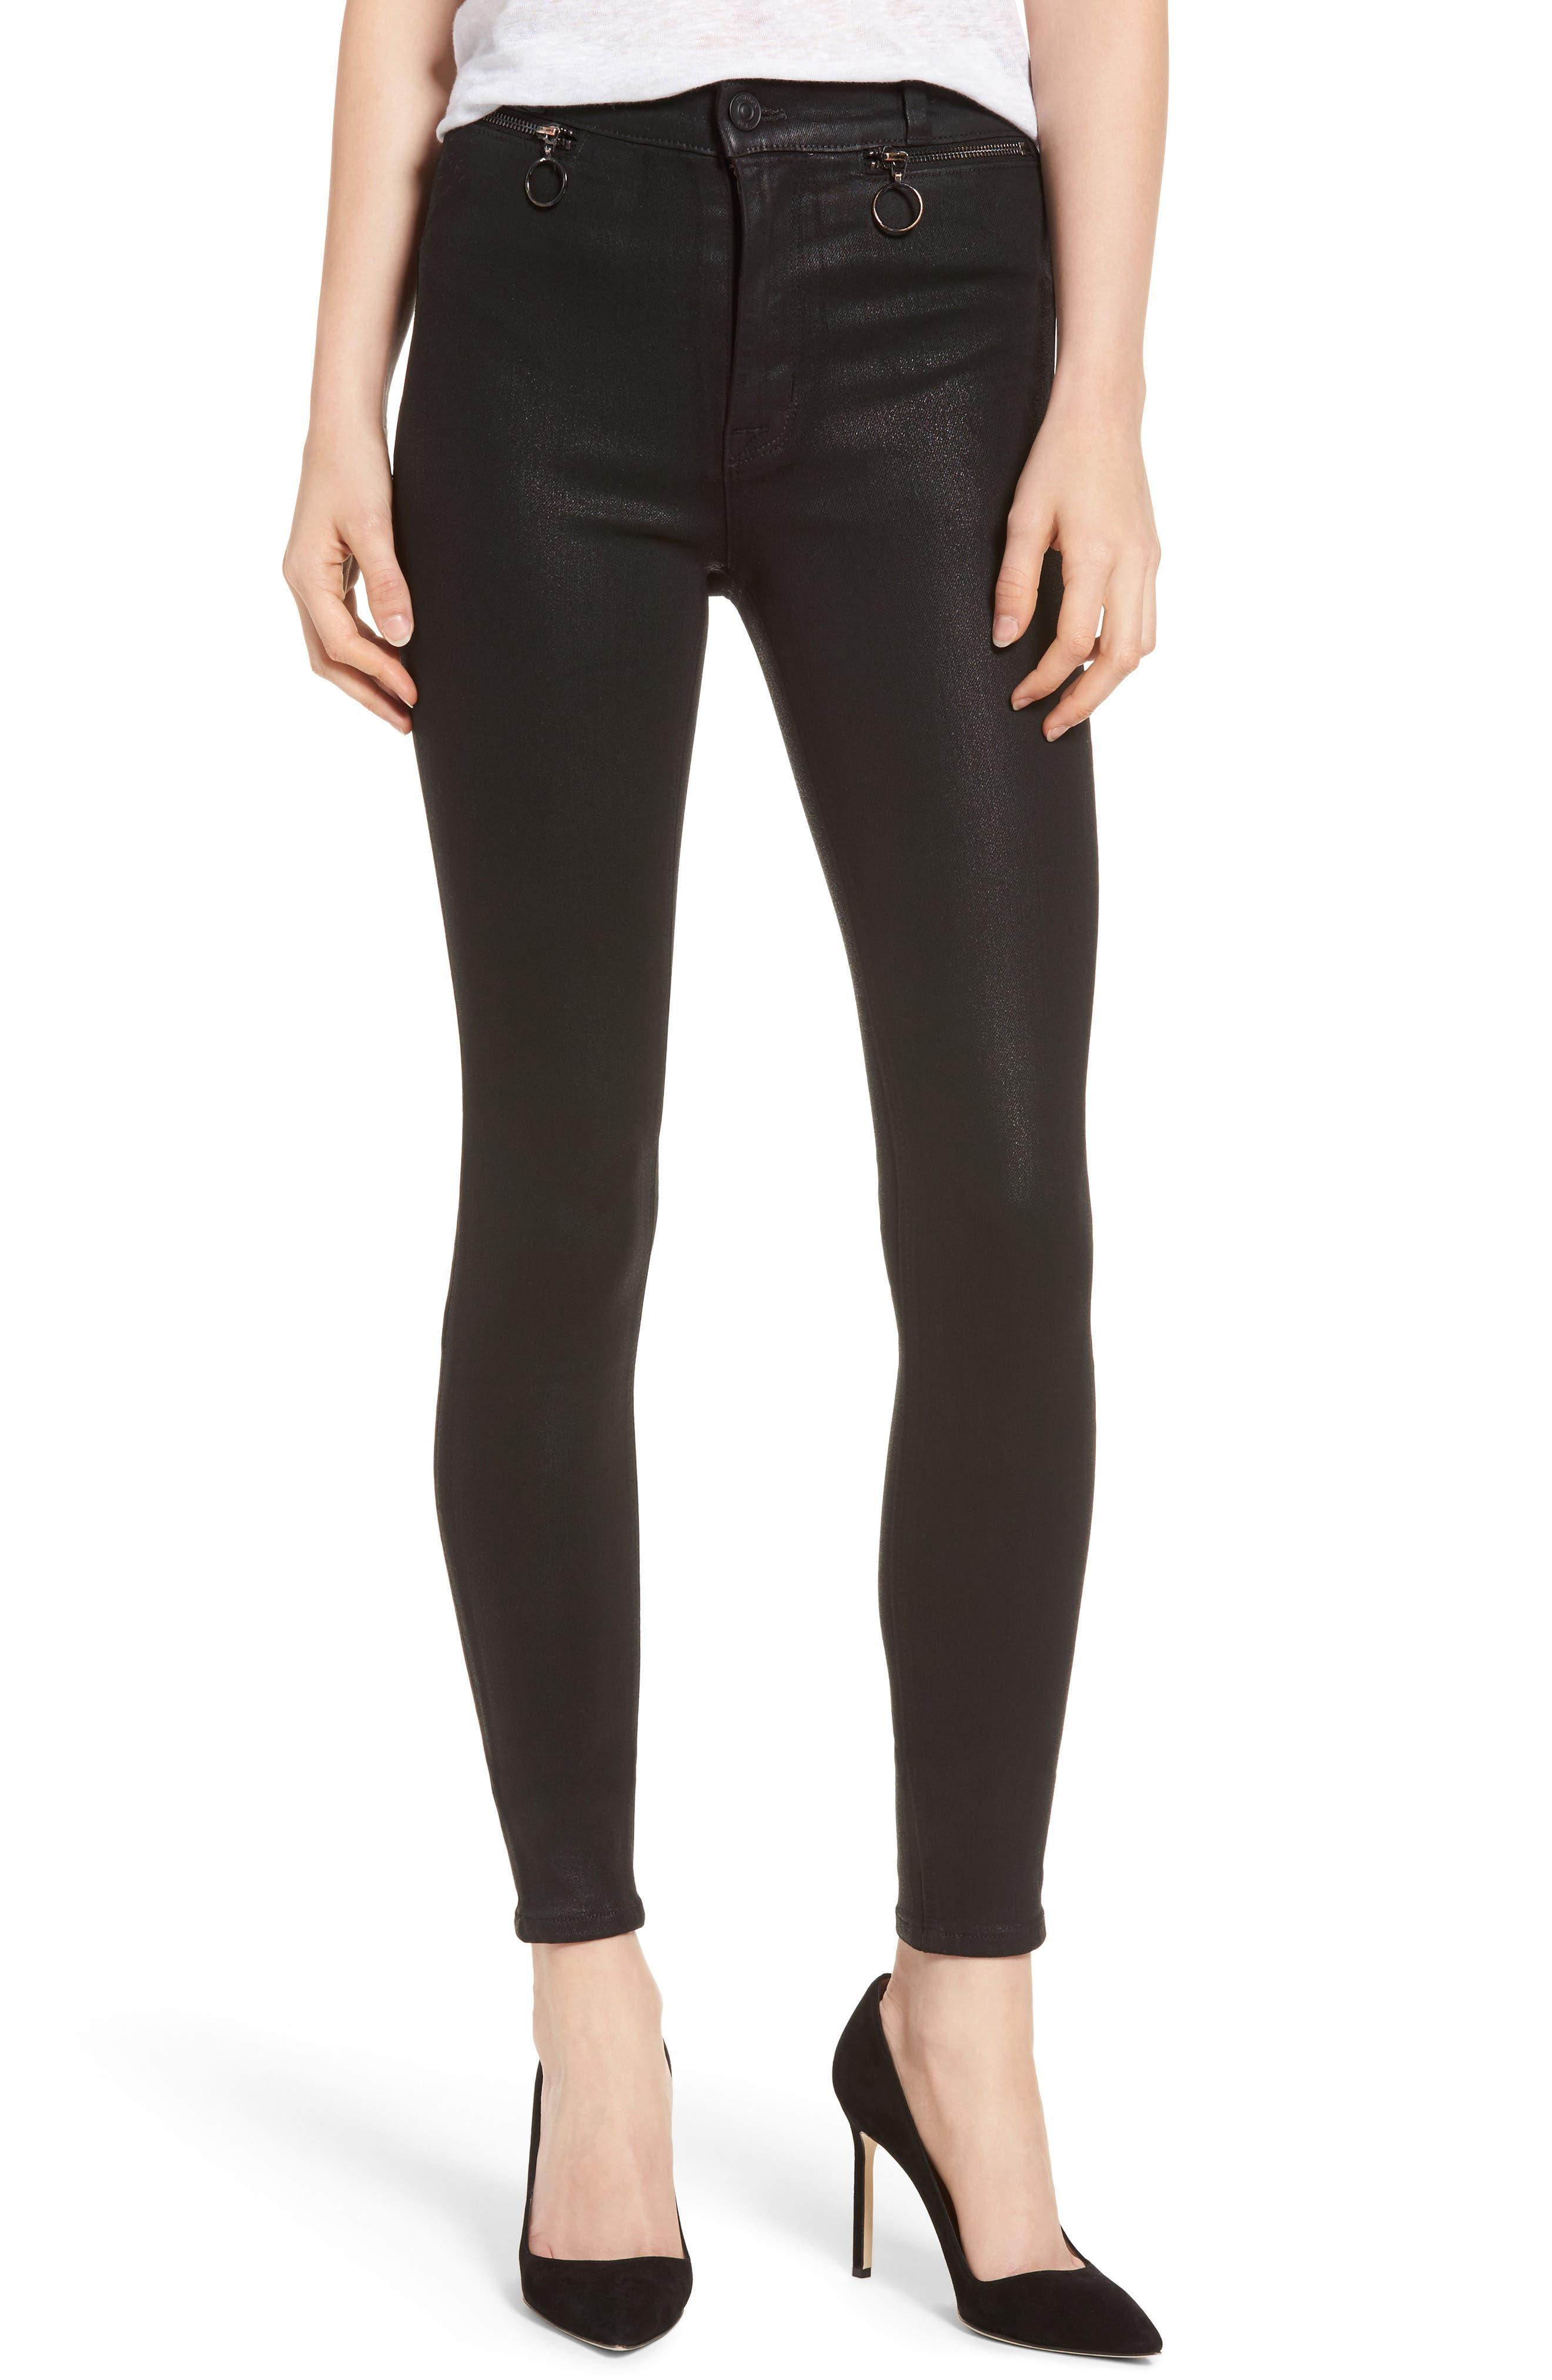 Main Image - Hudson Jeans Kooper Coated Skinny Jeans (Black Coated)